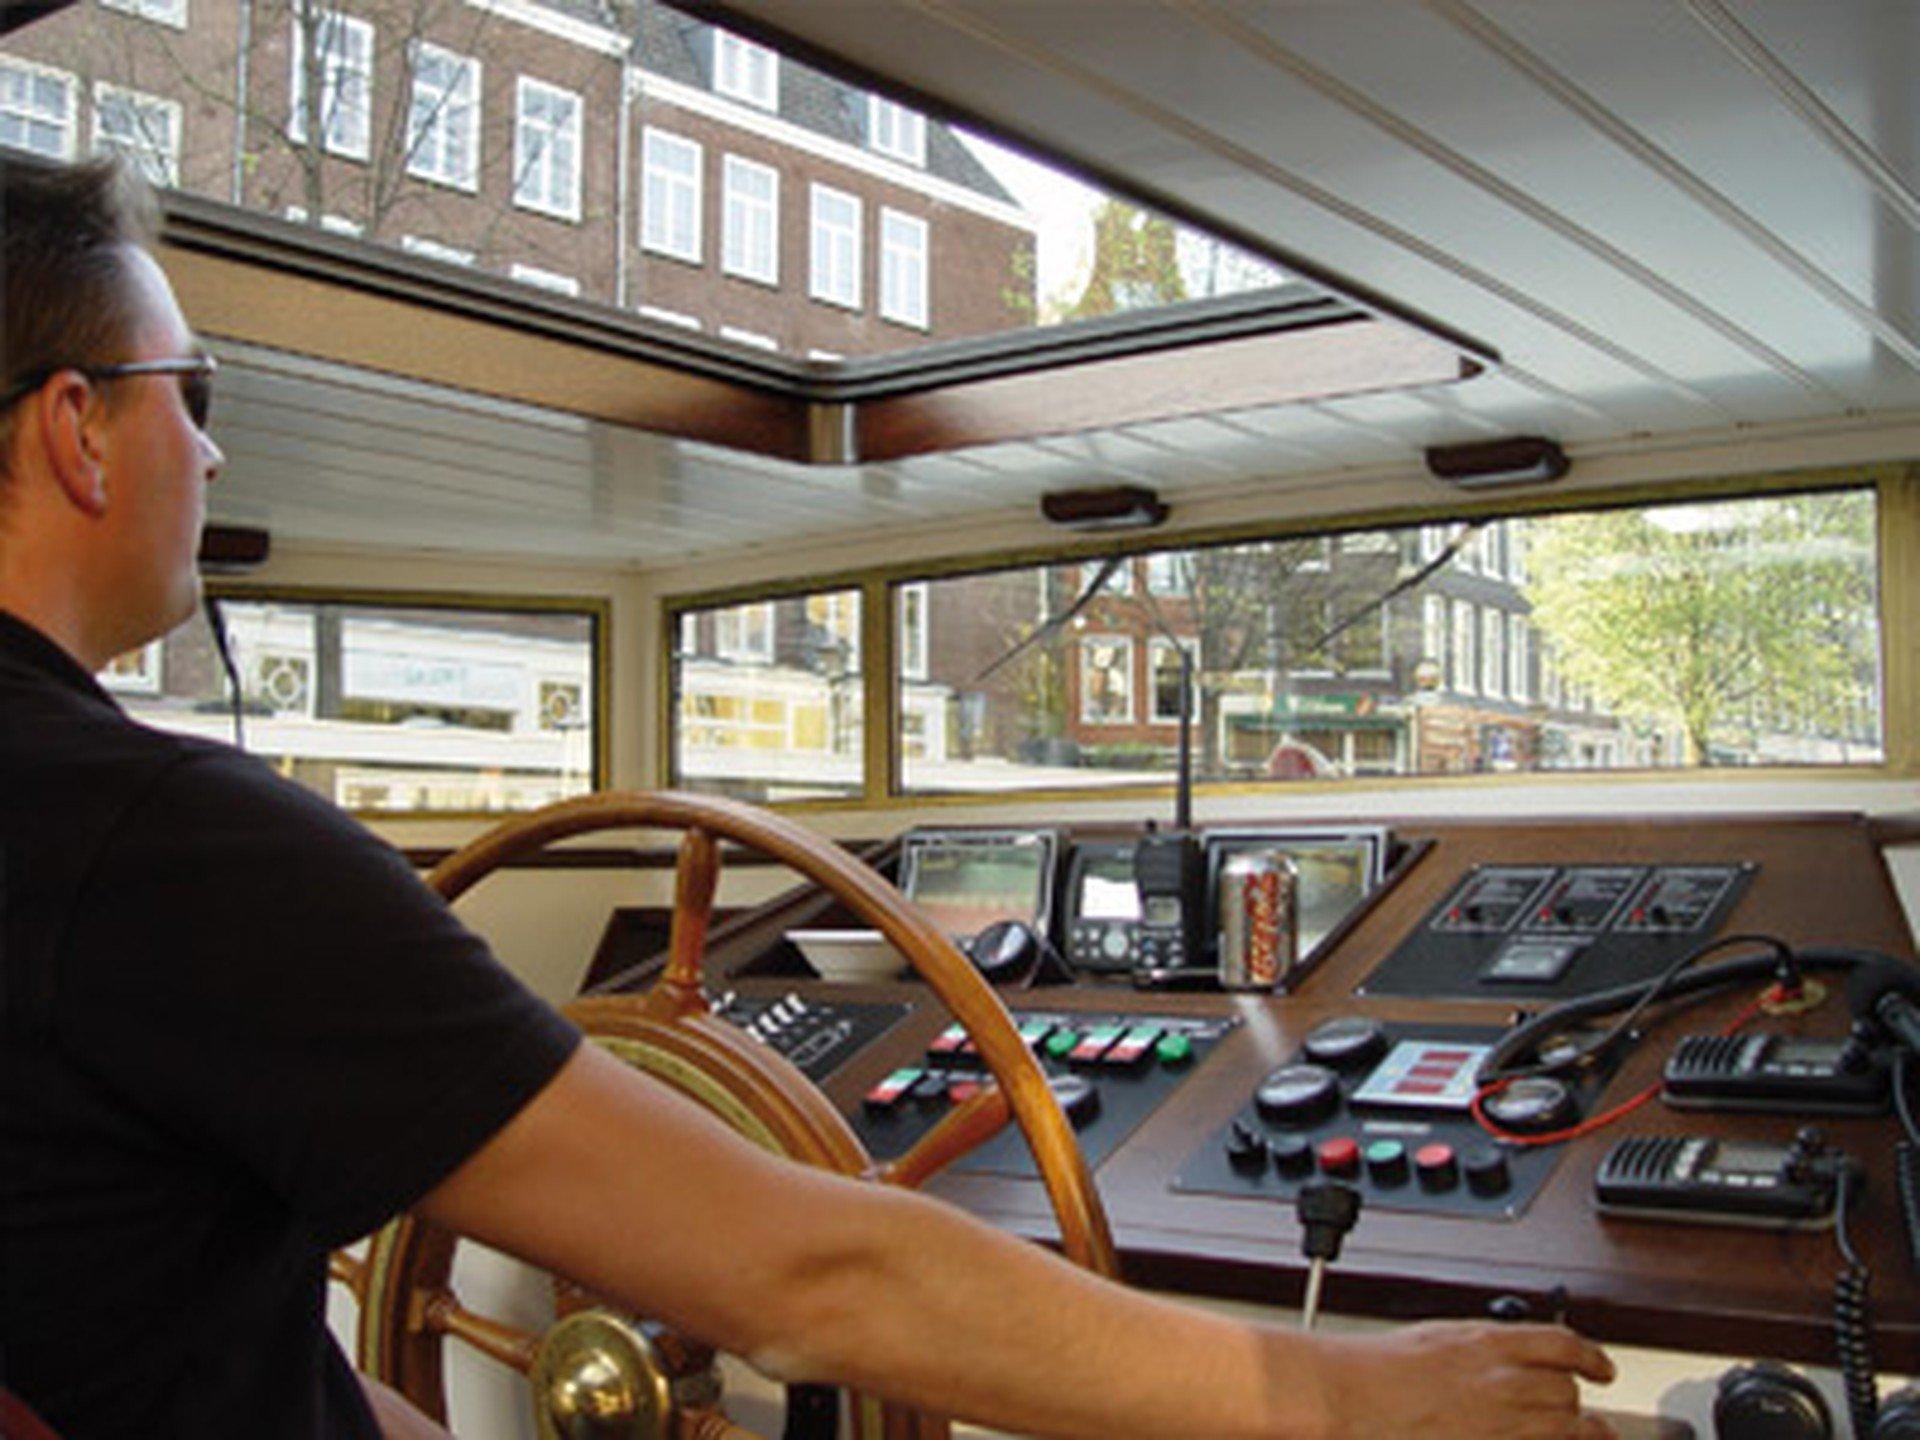 Amsterdam corporate event venues Boat 't Smidtje - Couperus image 10